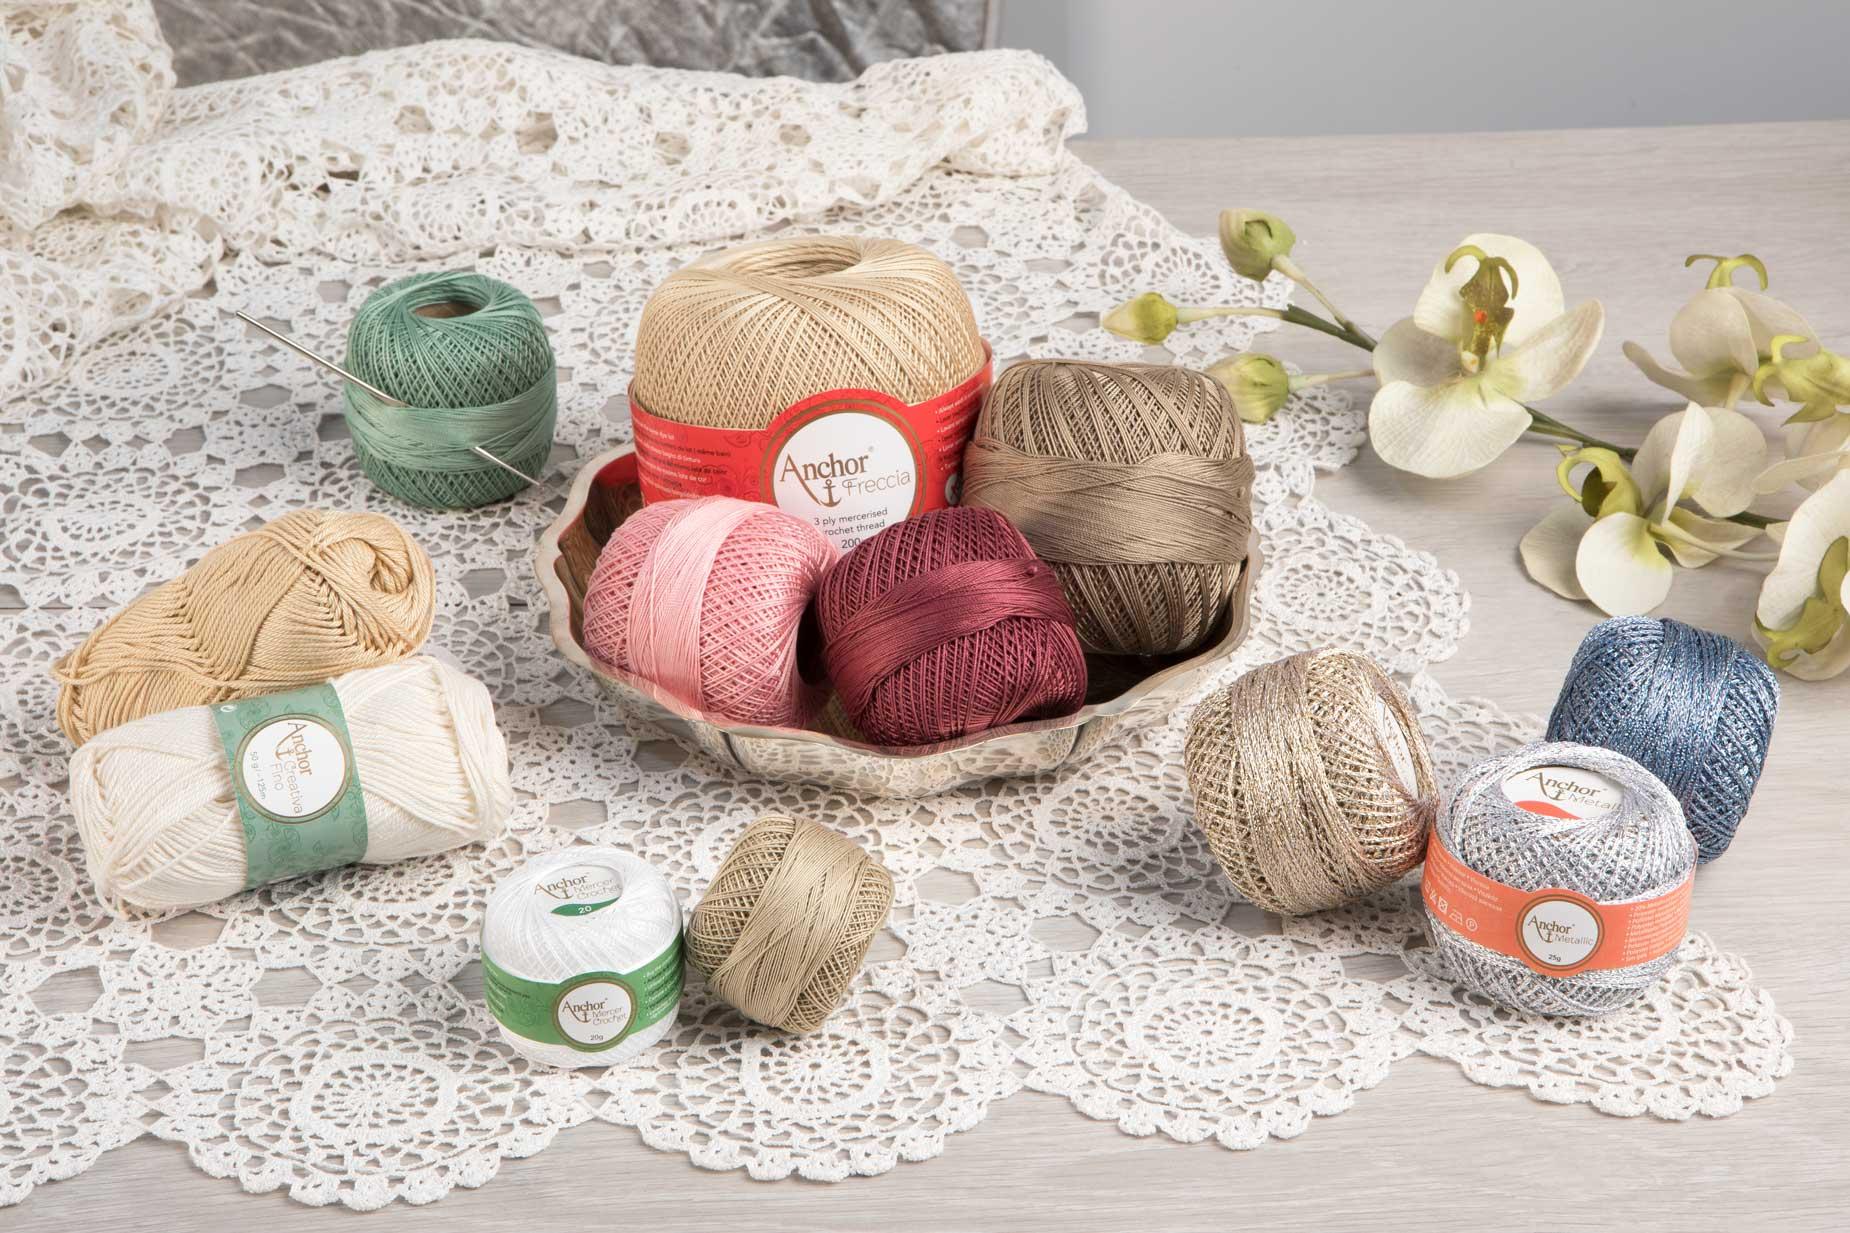 Amigurumi Mystic Trend Yarn 8 Pack - ALDI UK   1233x1850